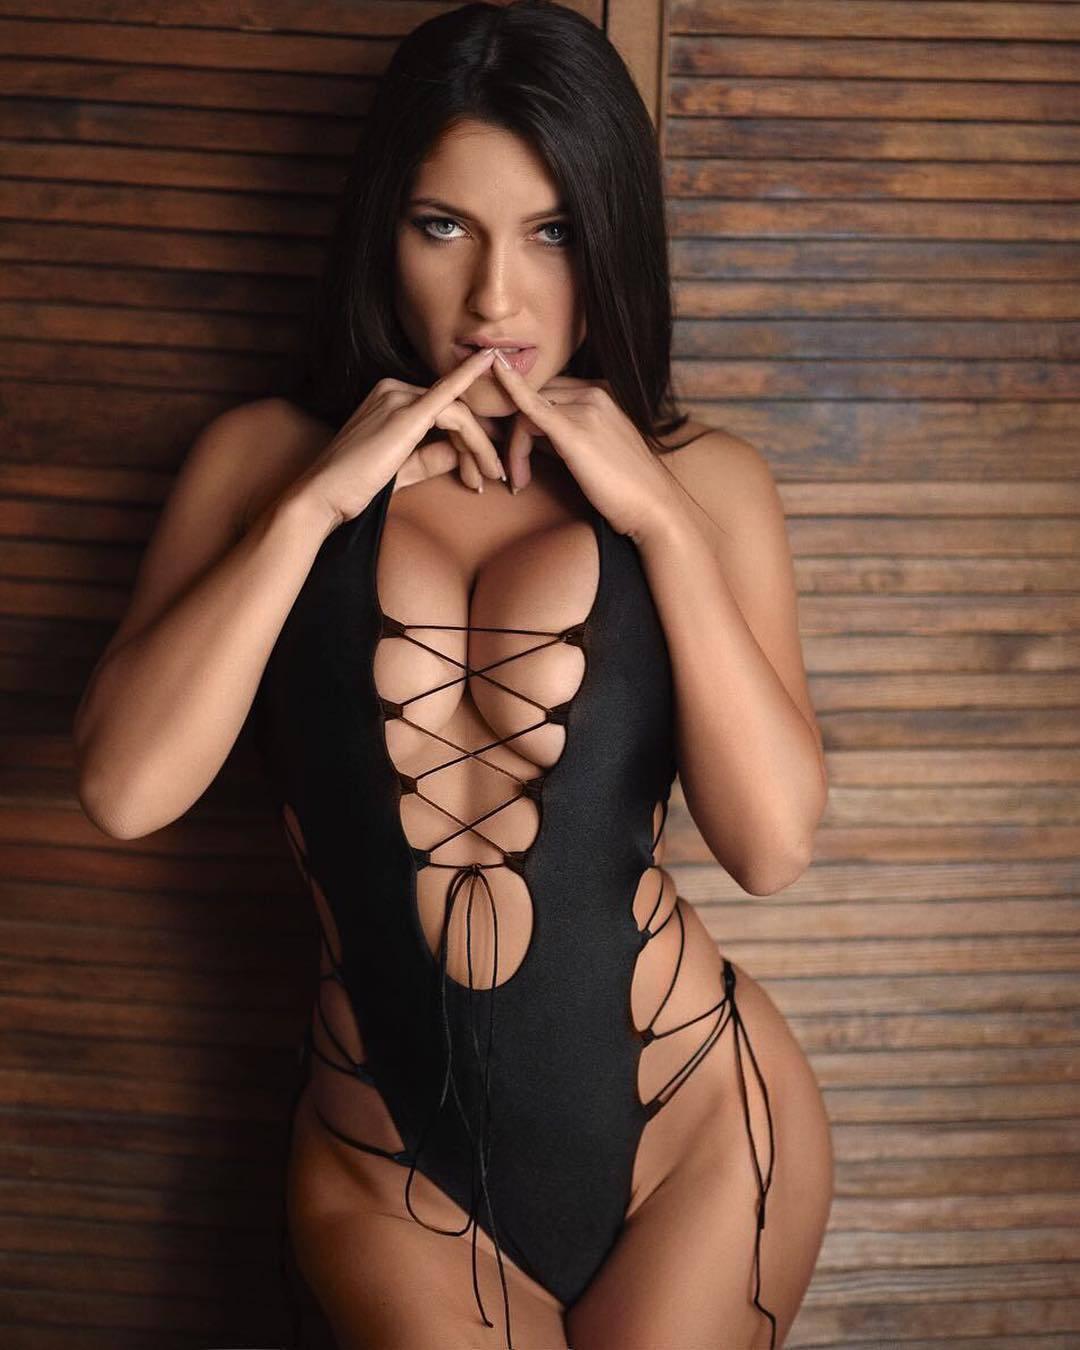 Olga Seteykina – Beautiful Body In Sexy Instagram Pics 0014